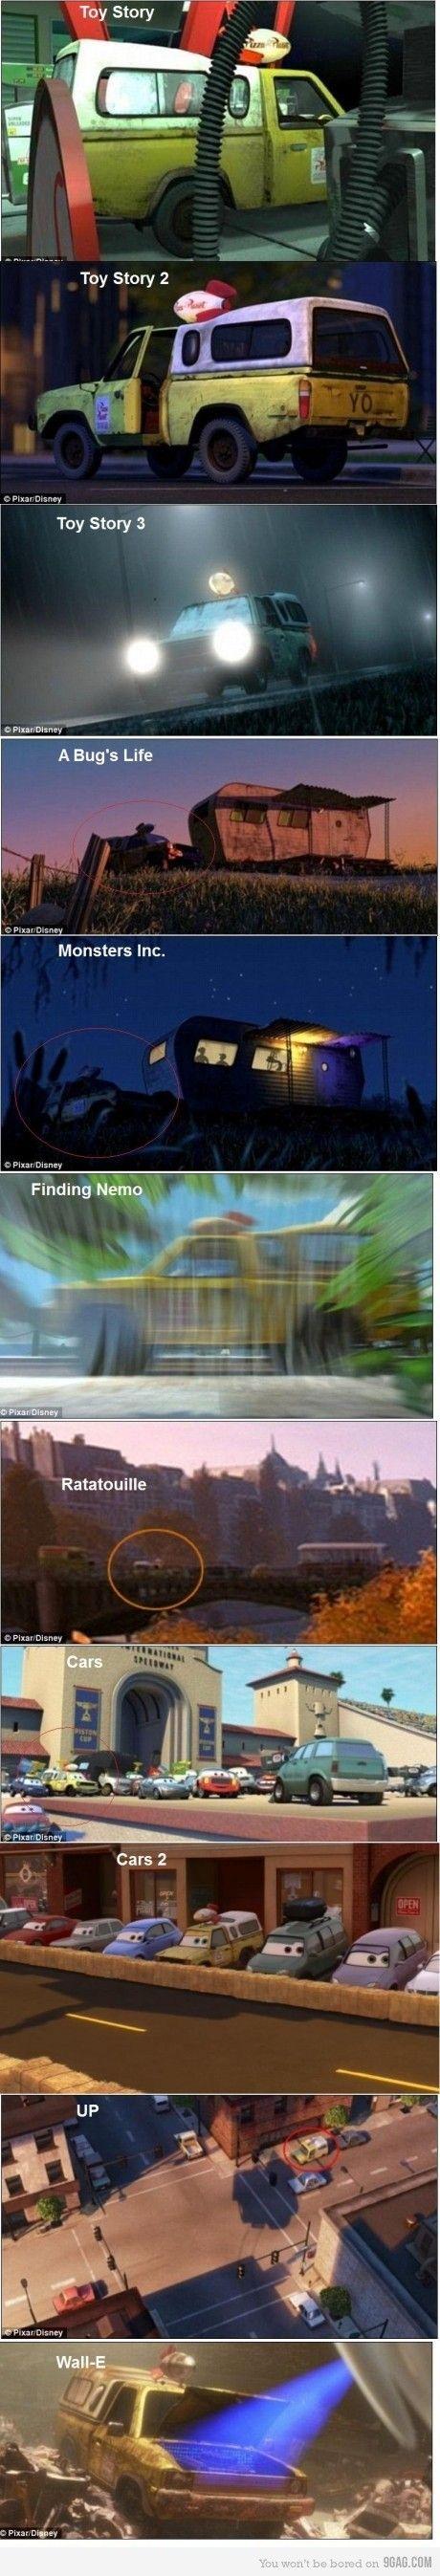 Gotta love Pixar <3